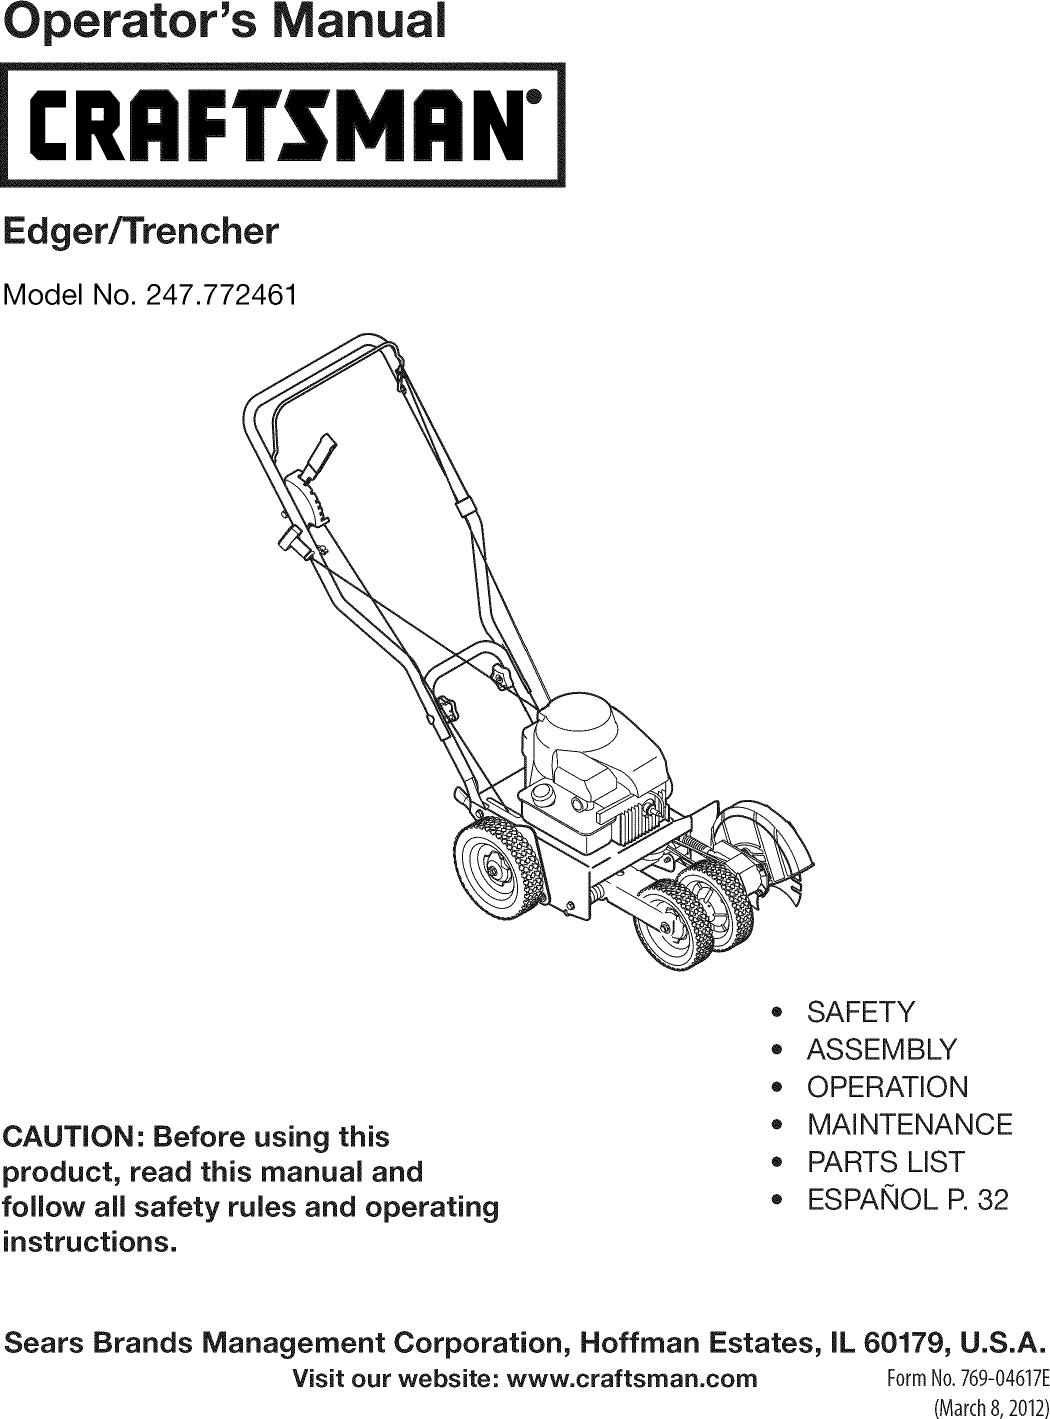 craftsman 247772461 1203555l user manual edger trencher manuals and rh usermanual wiki Craftsman Edger Blades craftsman edger owners manual